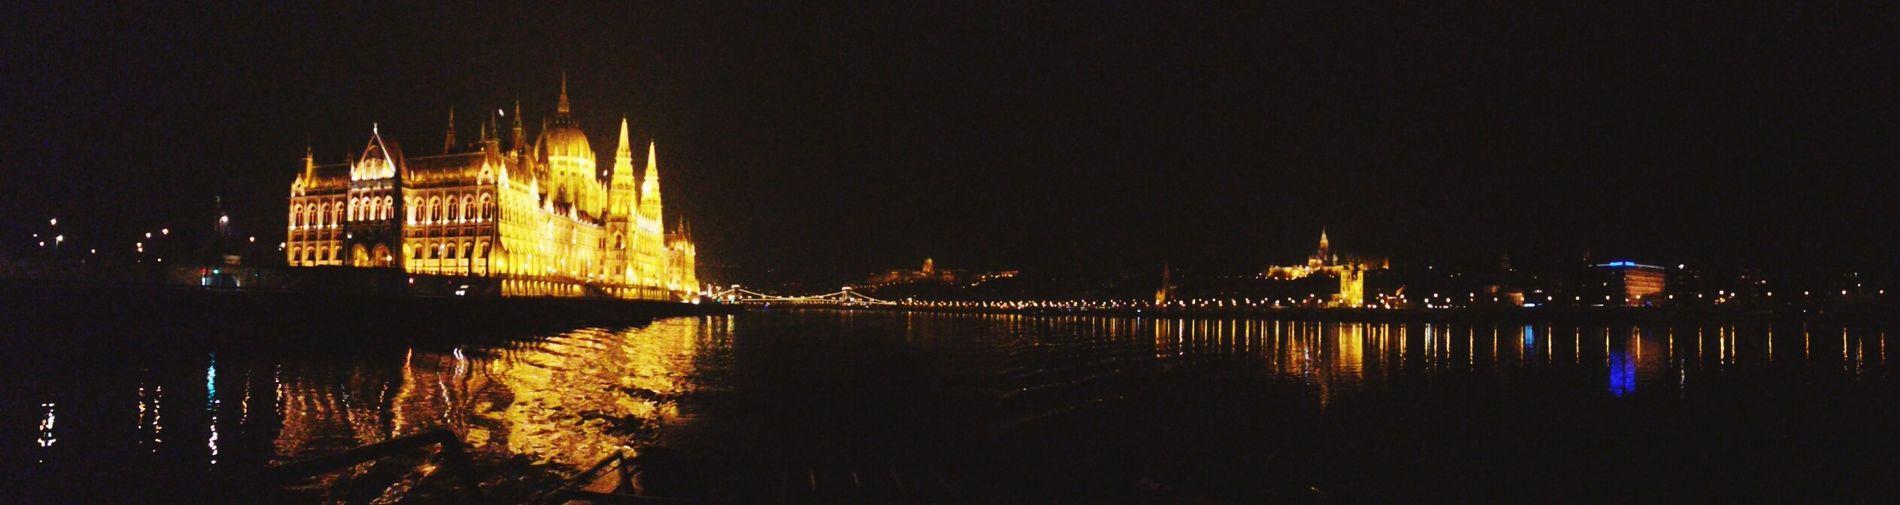 Budapest, Hungary Highschooltrip Danubio Night Lights Nightphotography